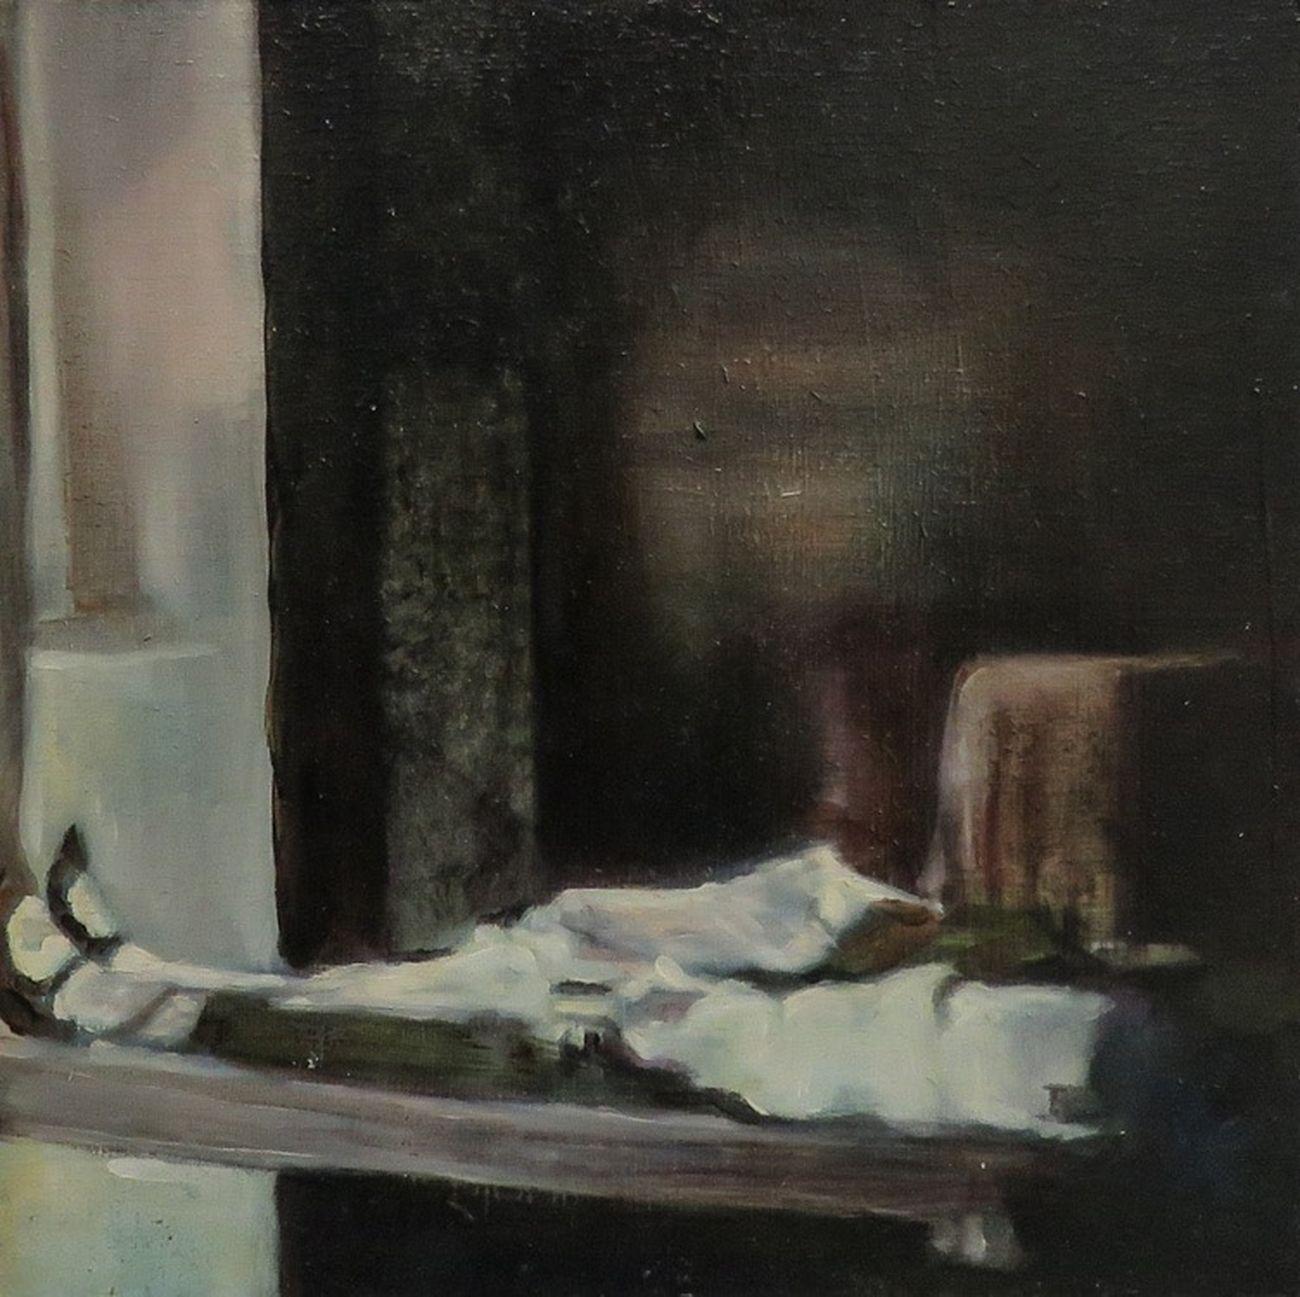 Iva Lulashi, Untitled, 2018, olio su tela, 20x20 cm. Courtesy Prometeogallery di Ida Pisani, Milano Lucca